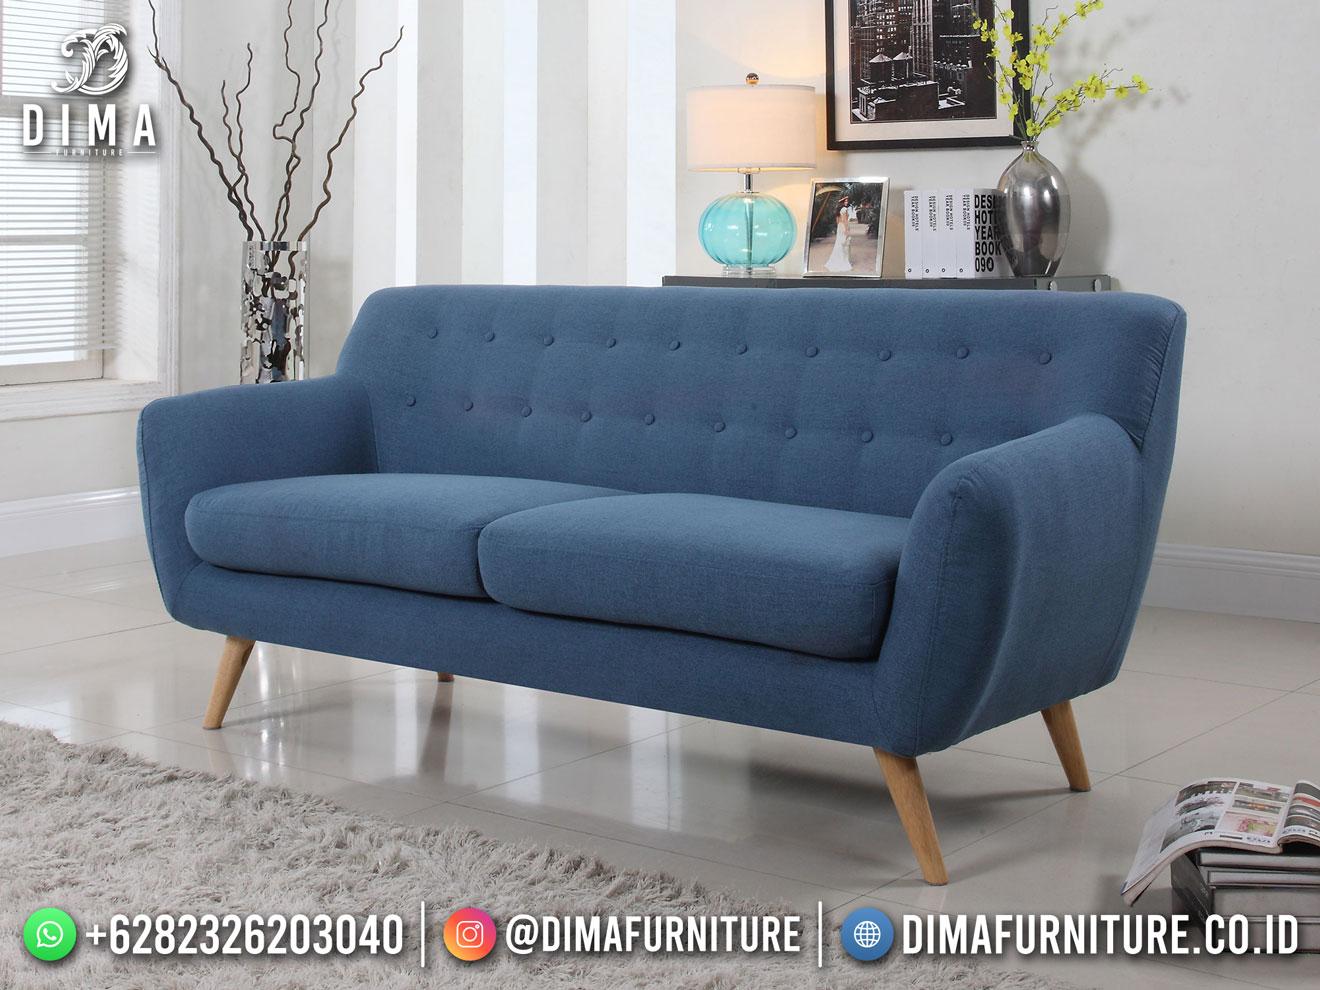 Best Seller Desain Sofa Minimalis Jepara Mid-Century Elegant Style BT-1107